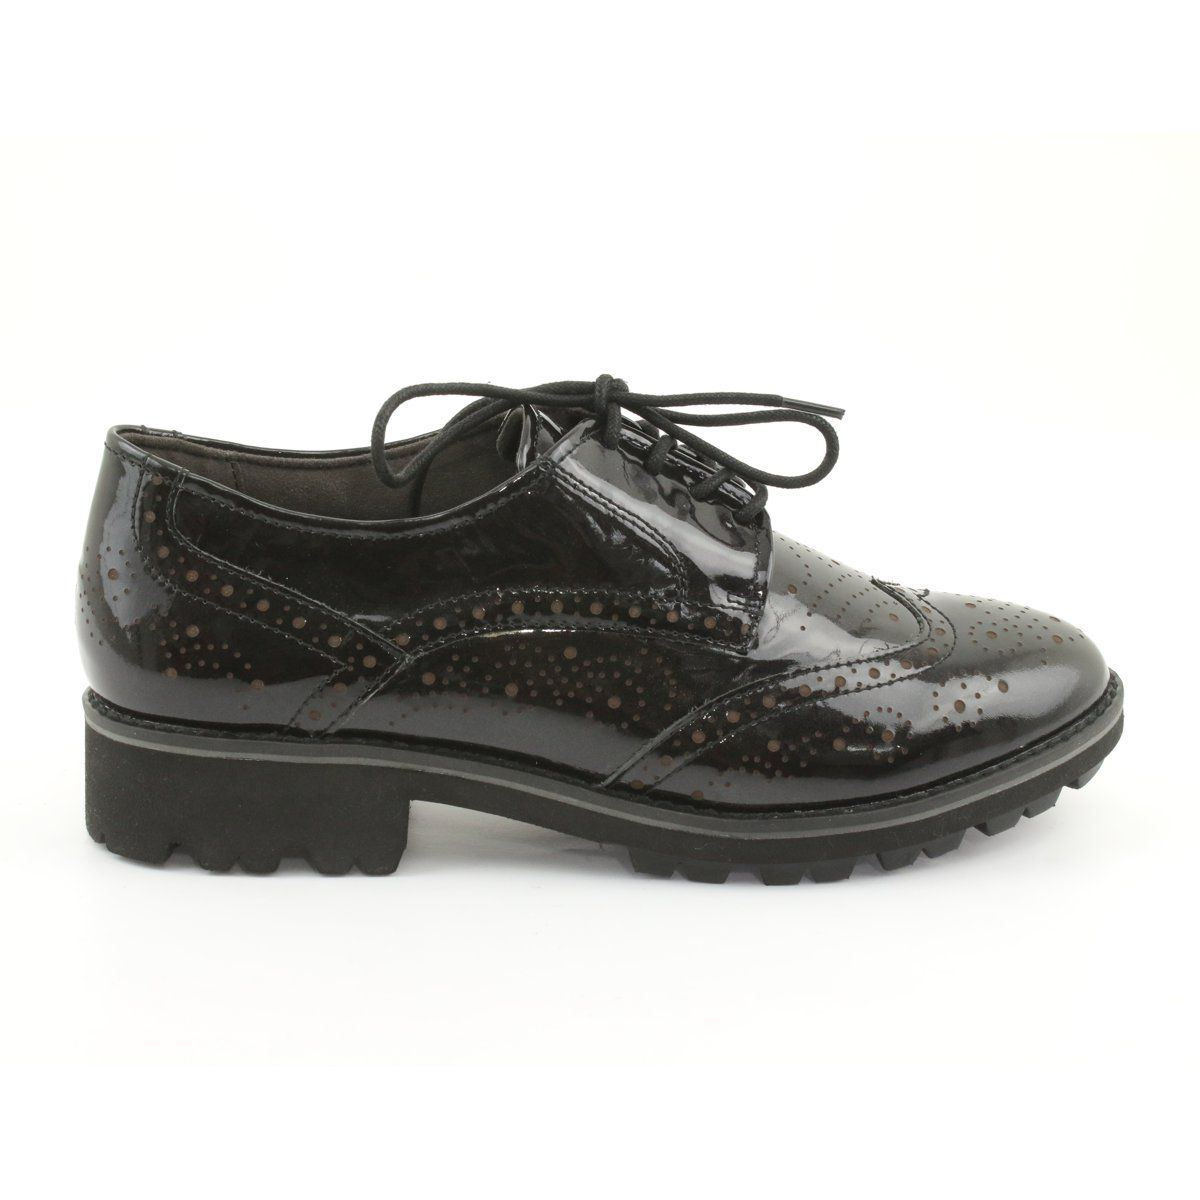 Oksfordki Polbuty Sznurowane Caprice 23701 Czarne Wielokolorowe Oxford Shoes Lace Up Shoes Women Oxford Shoes